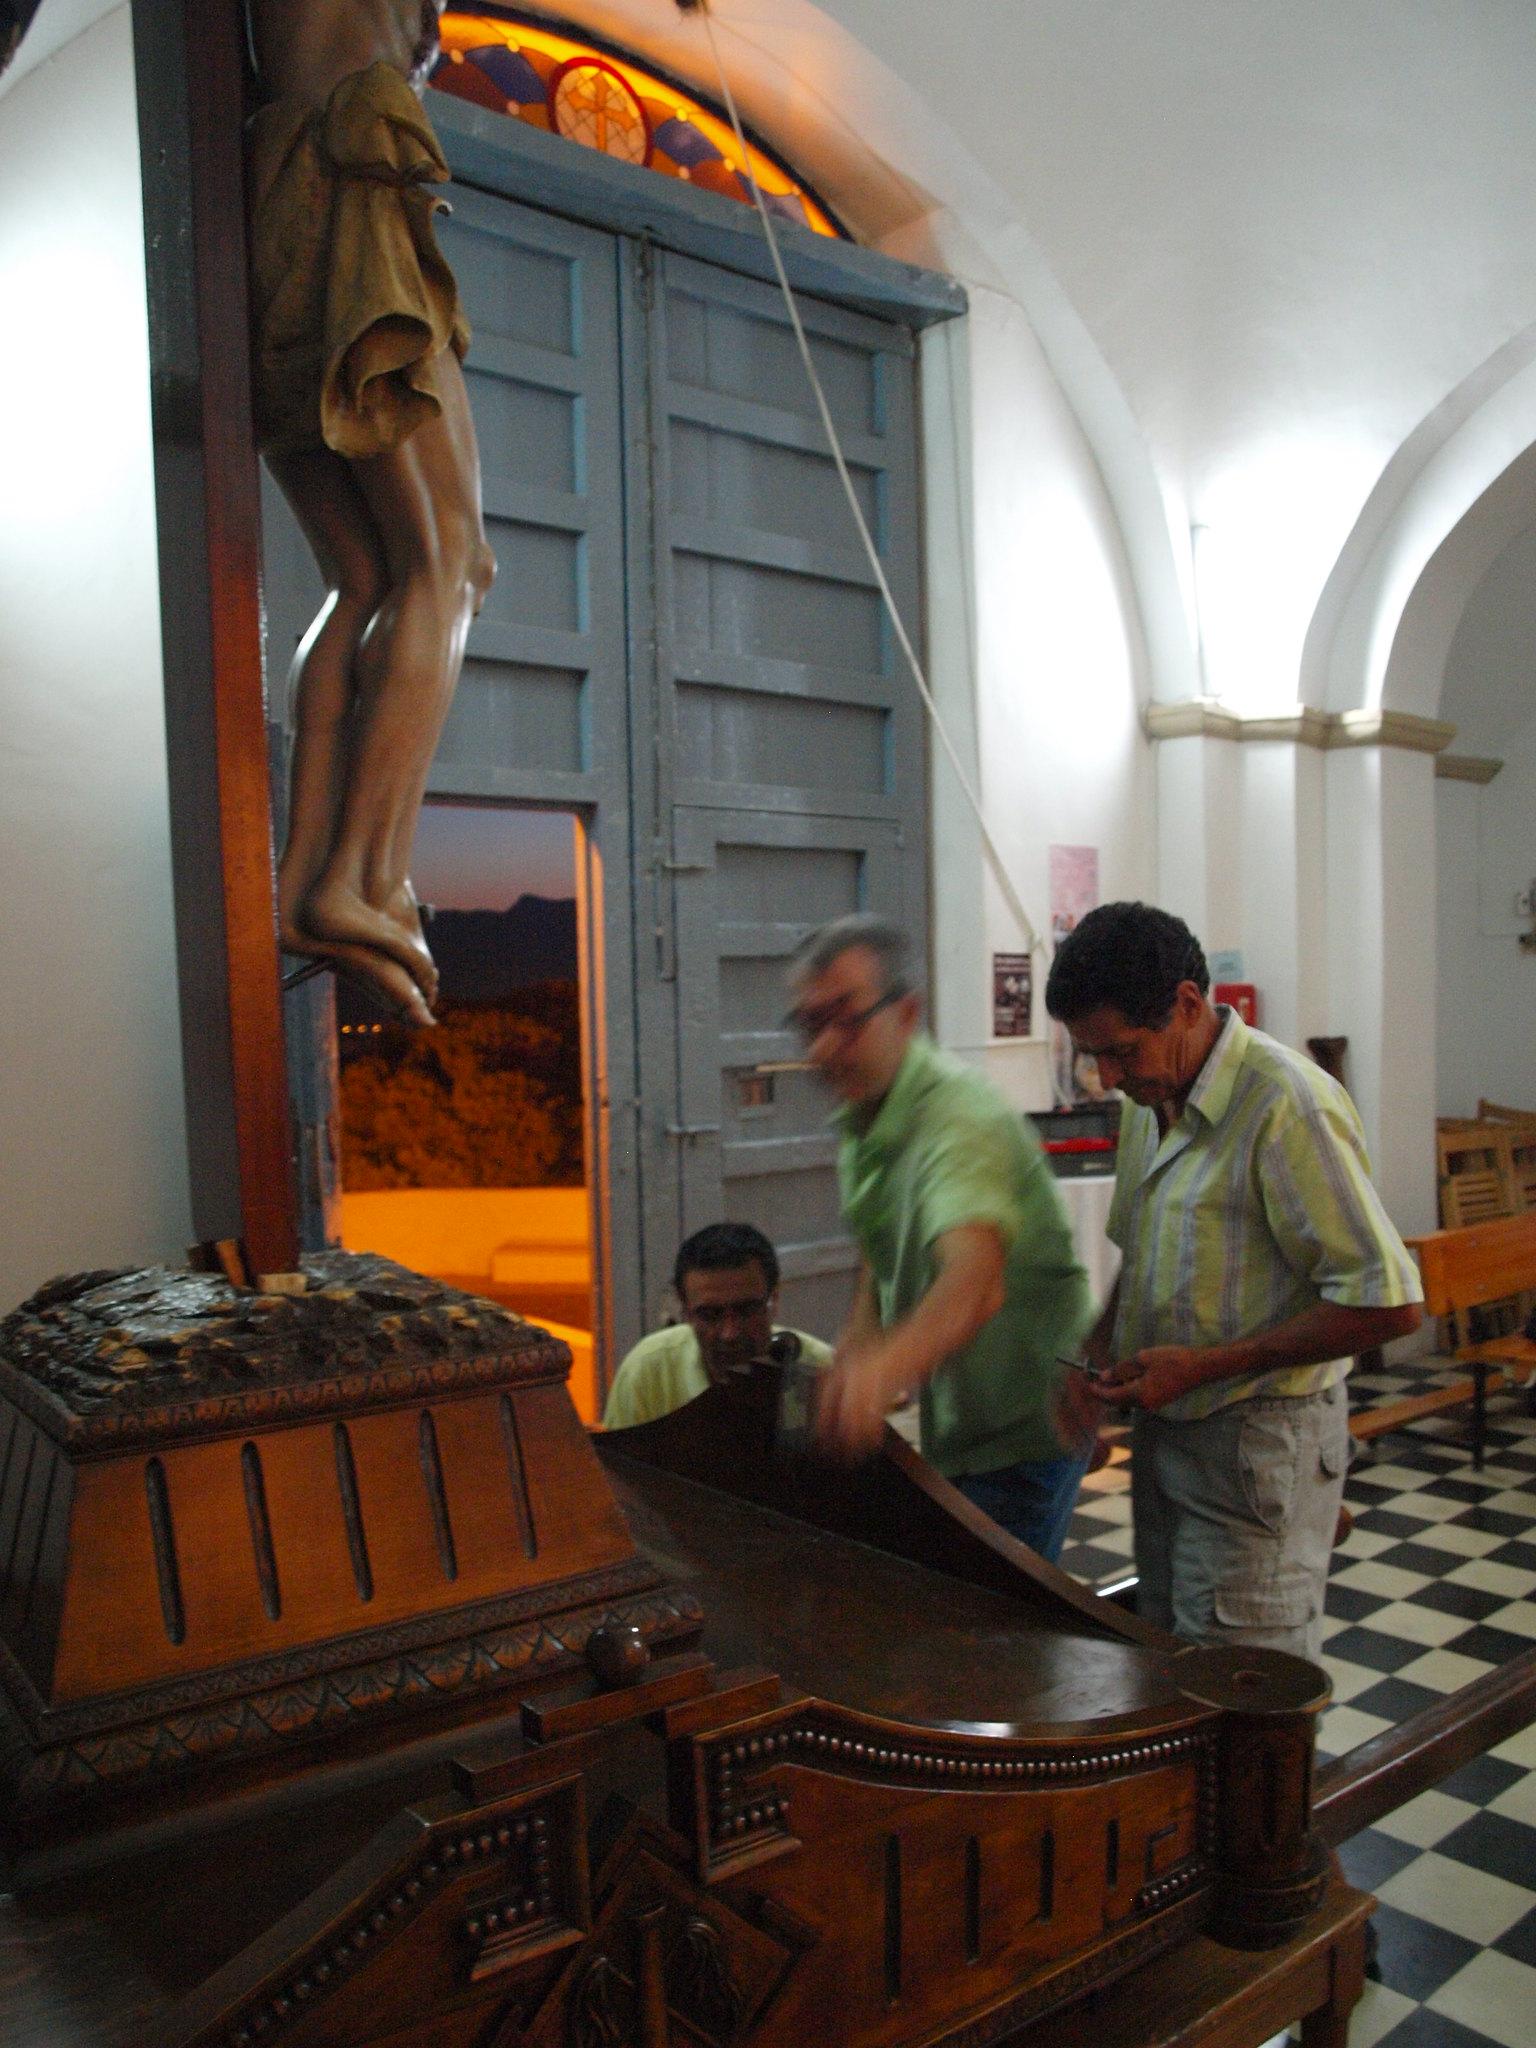 (2014-07-07) - Recogida de Imagen - Paloma Romero Torralba (17)